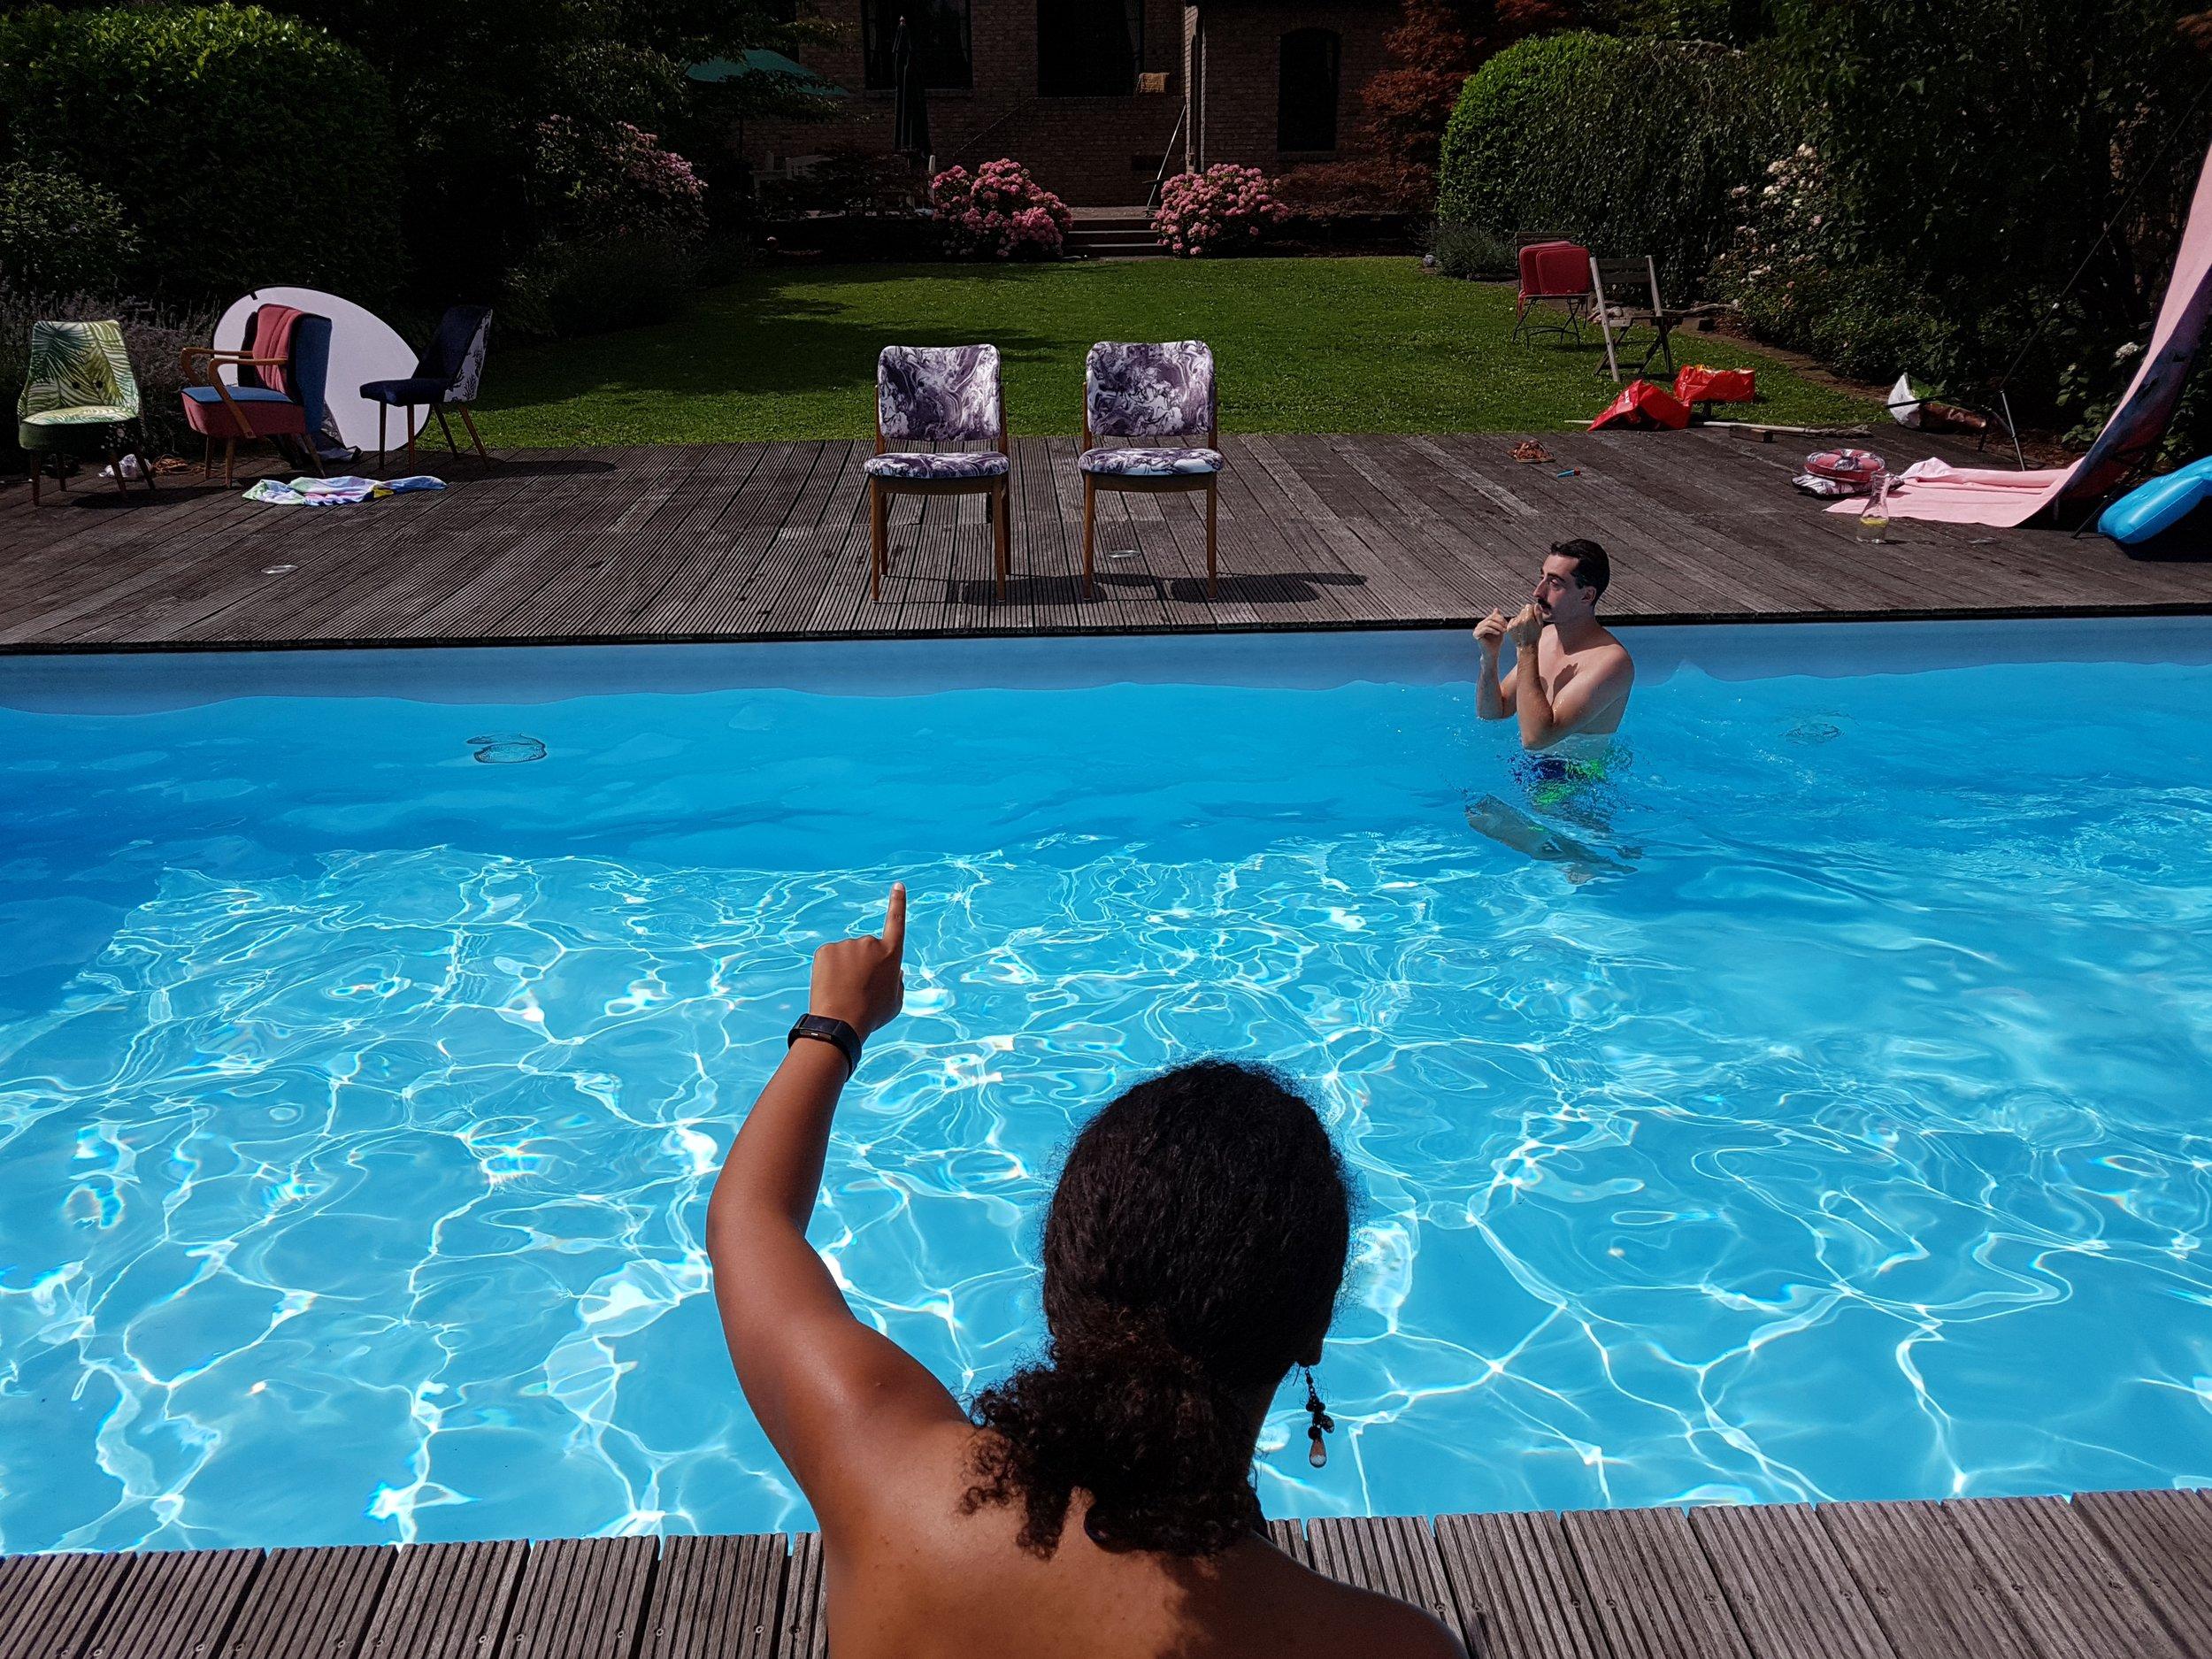 david hockney meets wes anderson accent chair pool shoot.jpg